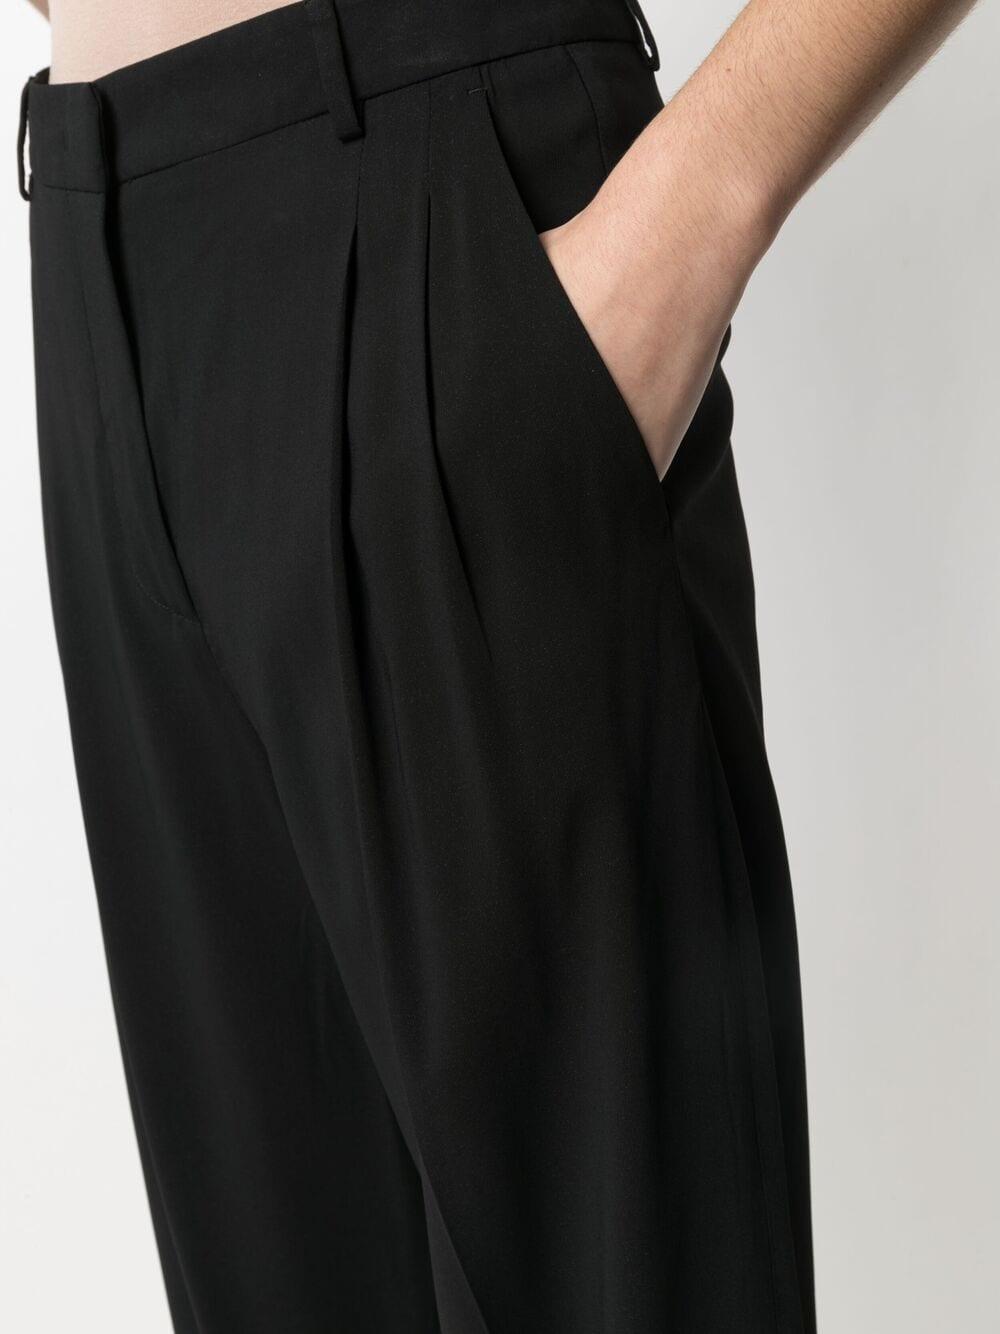 Black cropped straight-leg trousers featuring pleat detailing ALBERTO BIANI |  | CC802-VI008190